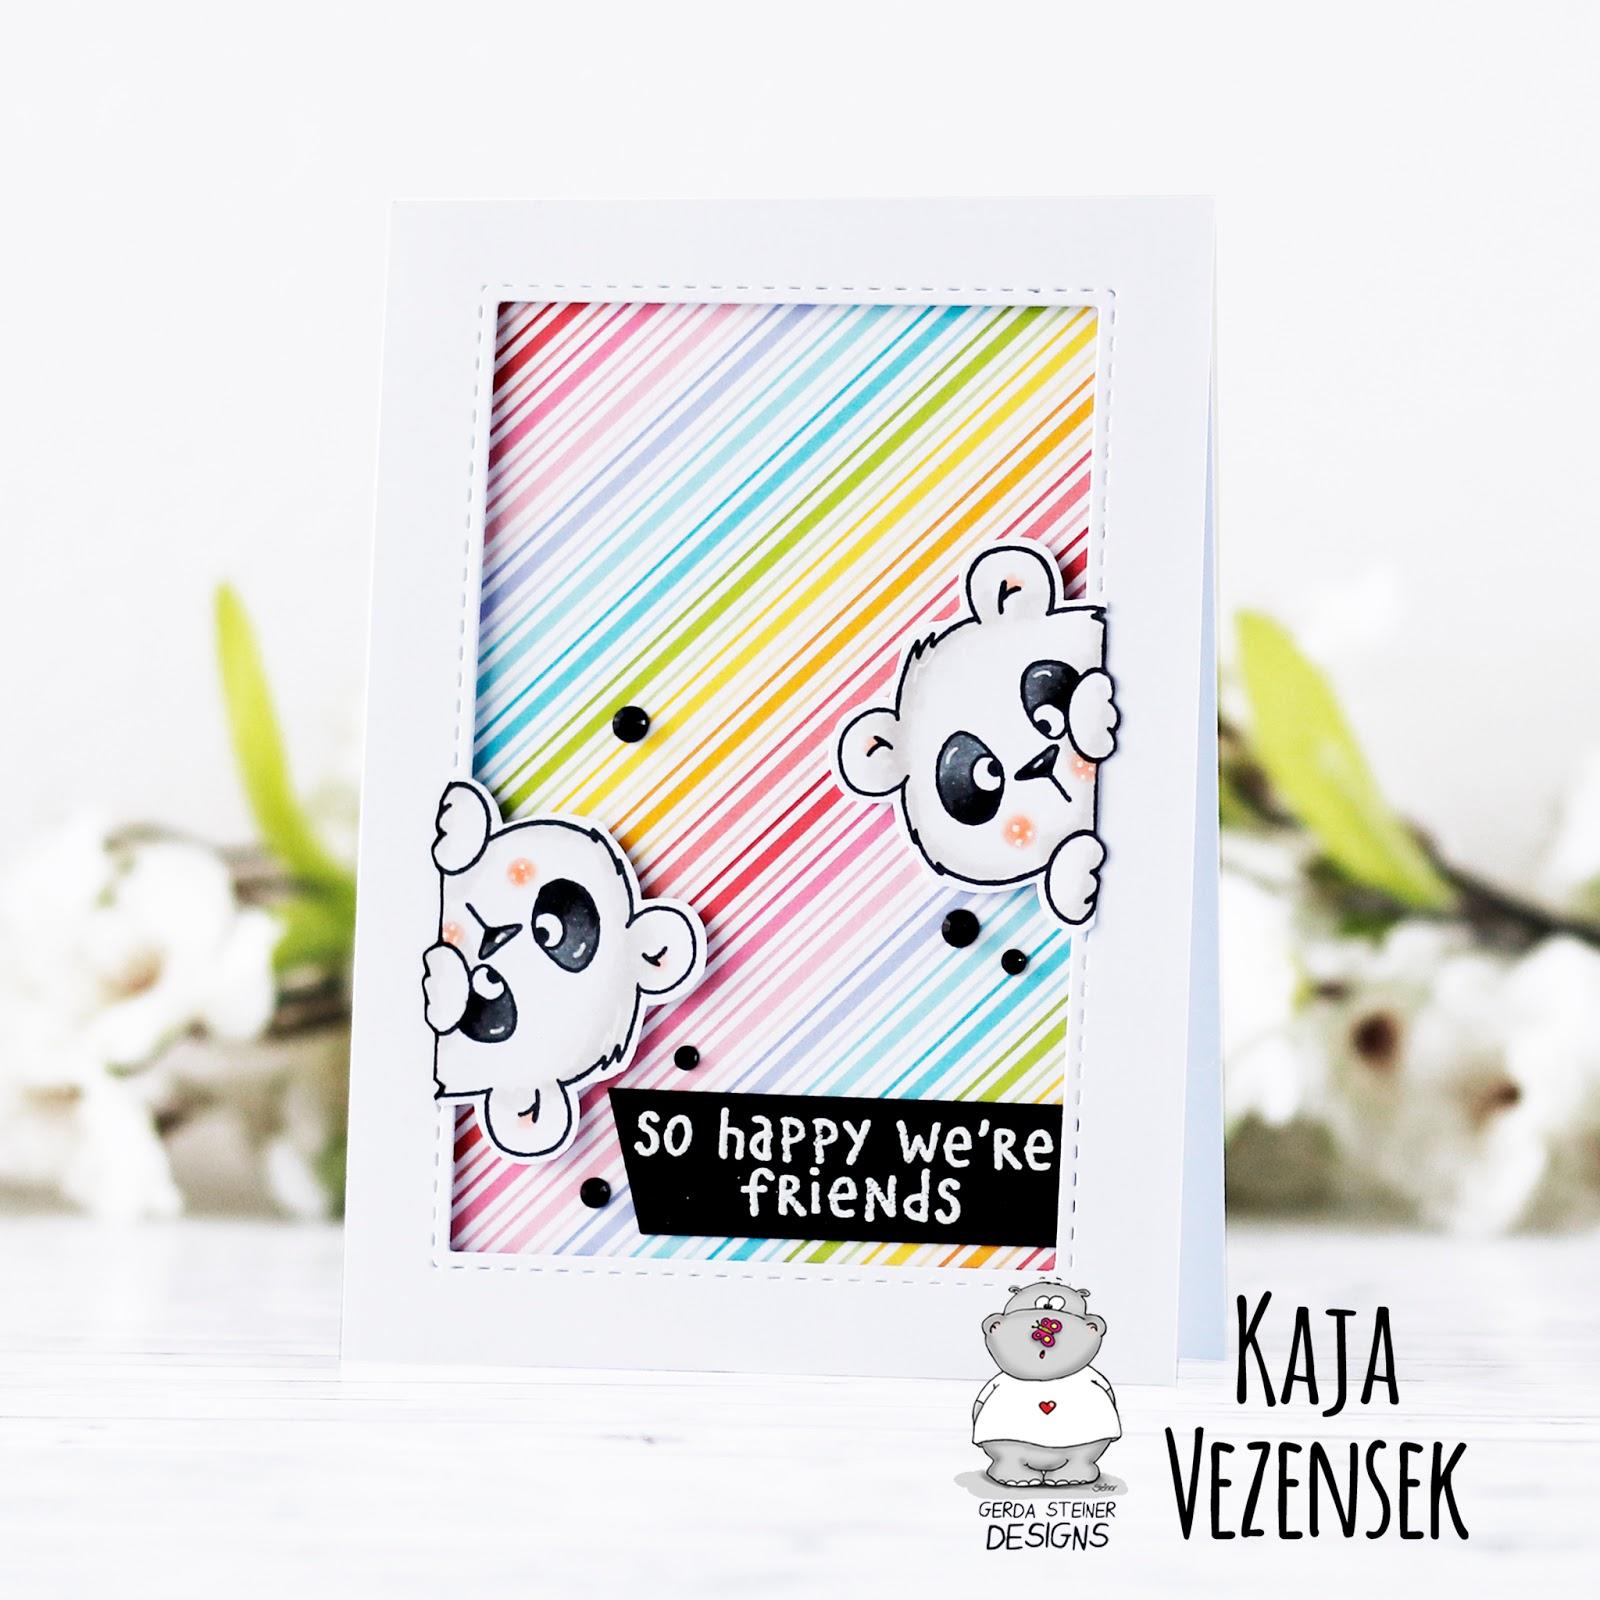 Lovely pandas | GERDA STEINER